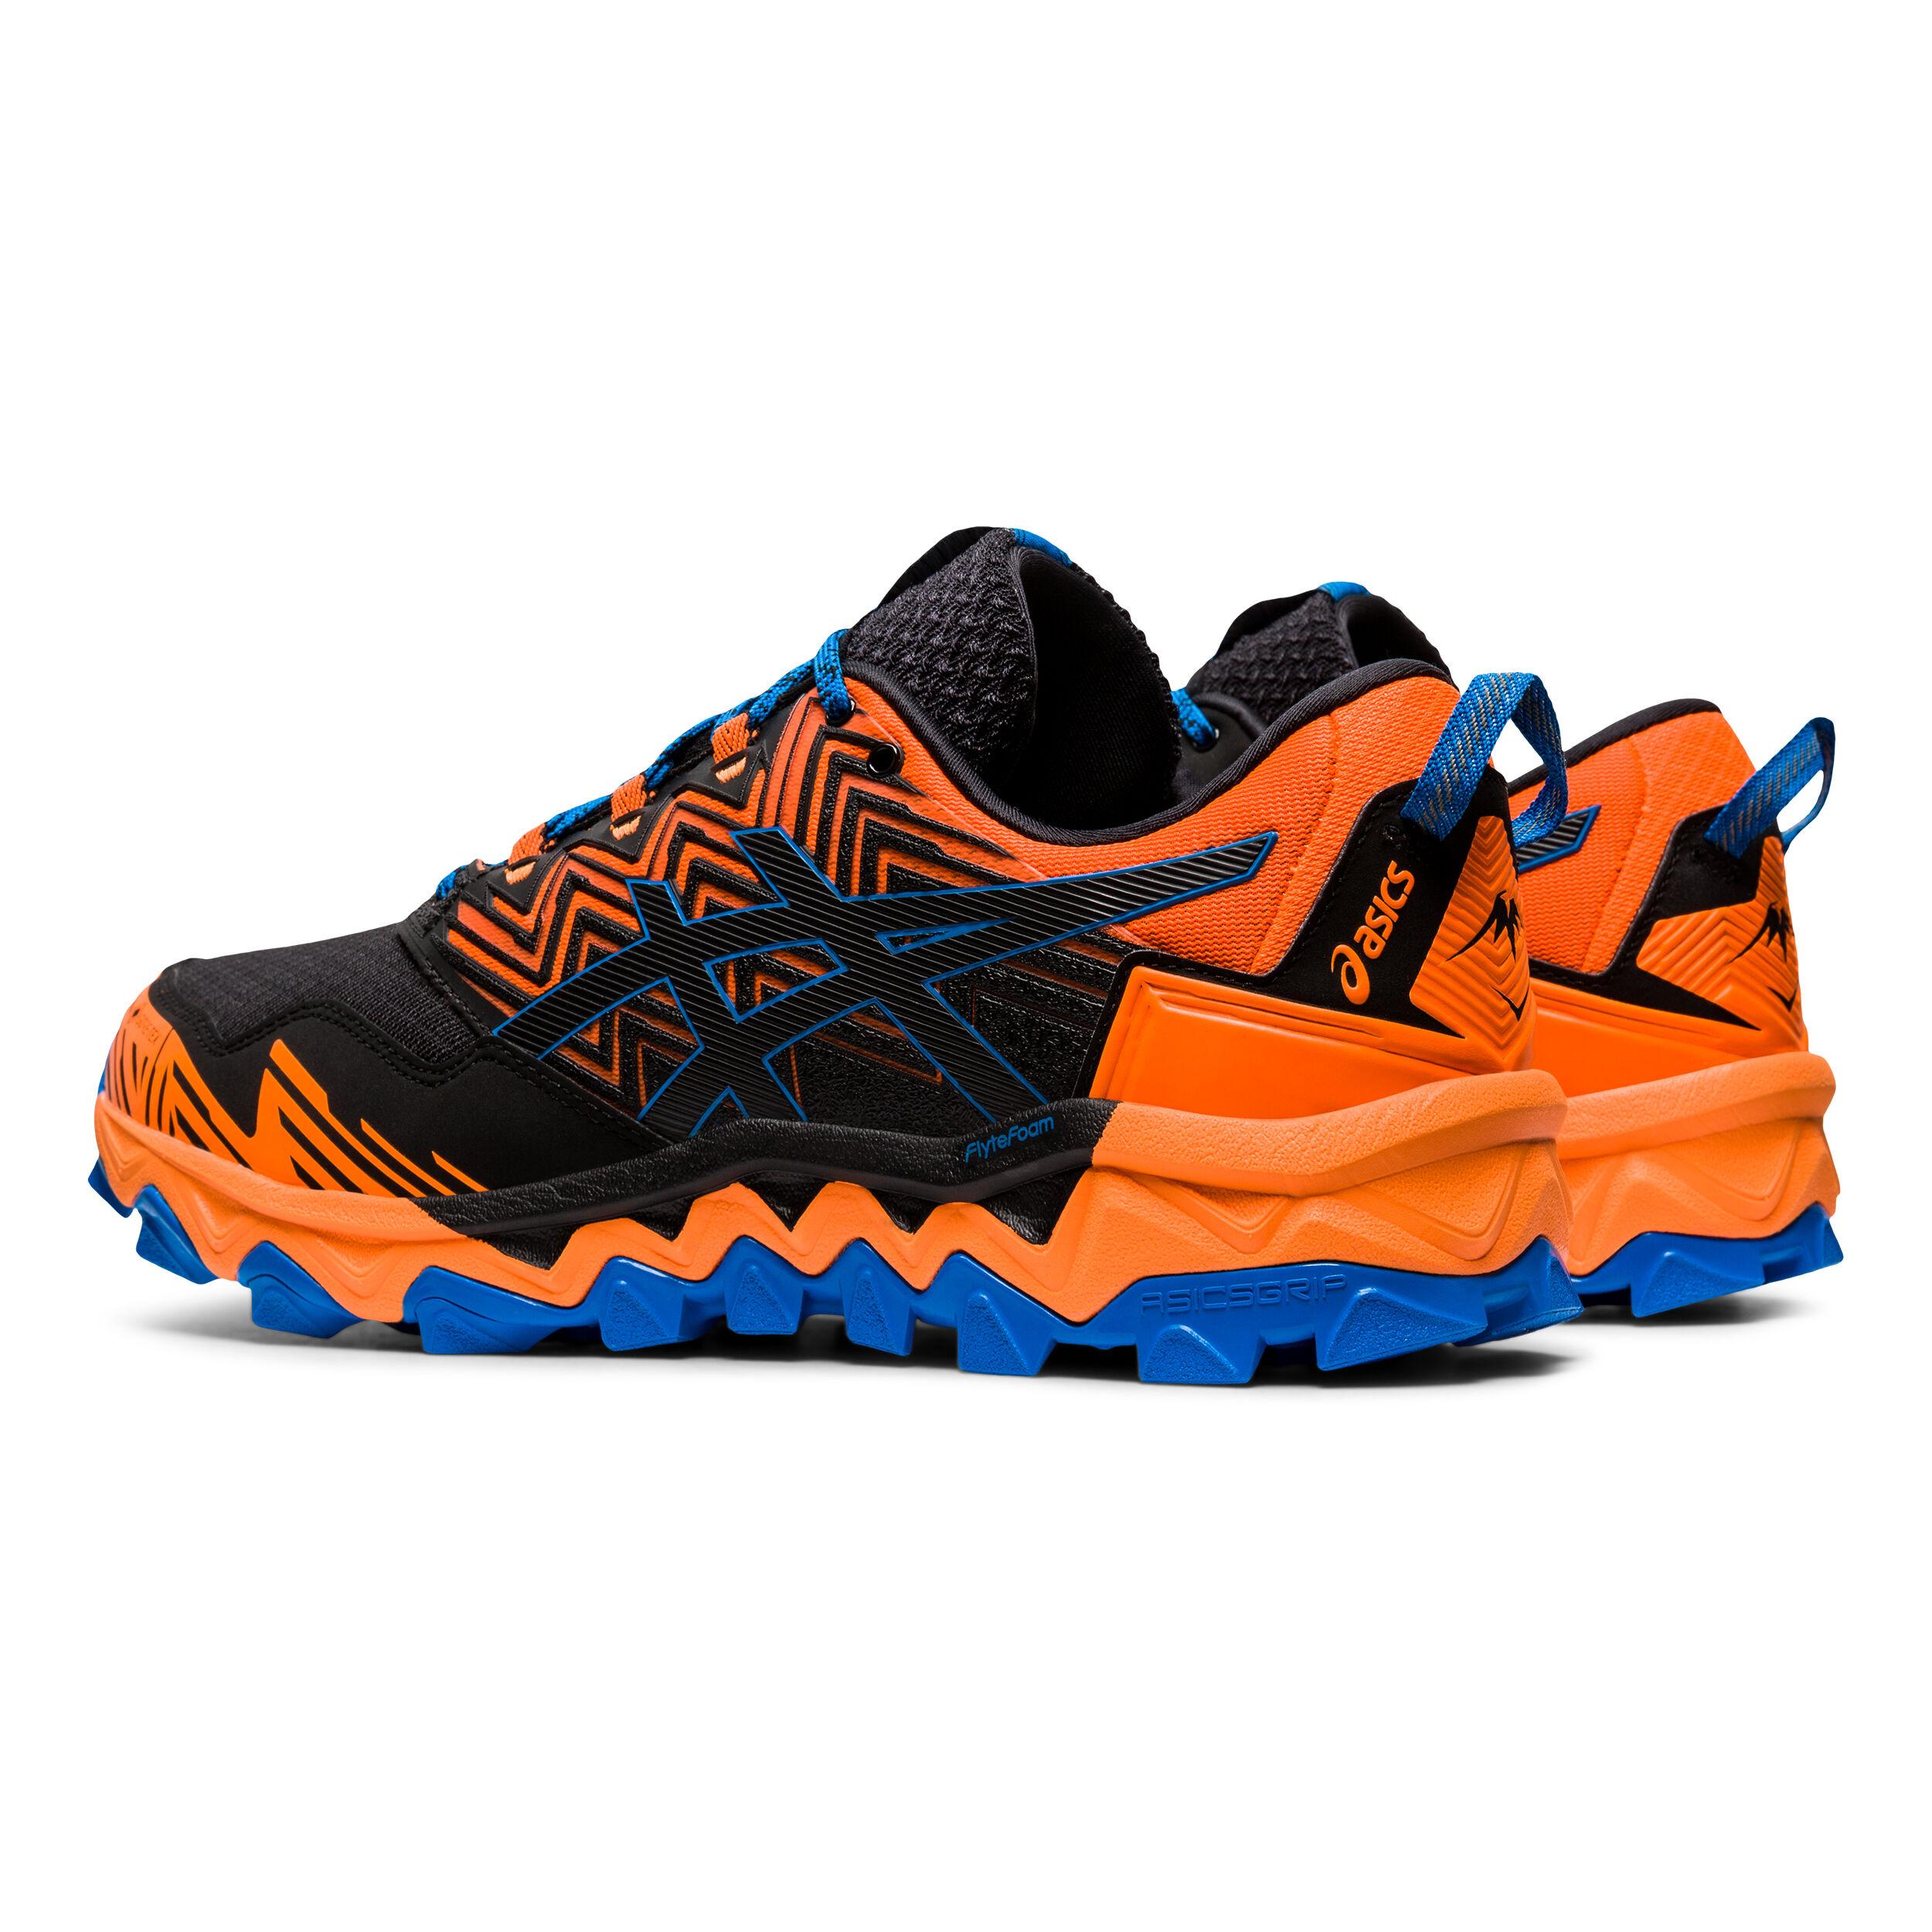 buy Asics Gel-Fuji Trabuco 8 G-TX Trail Running Shoe Men - Orange ...